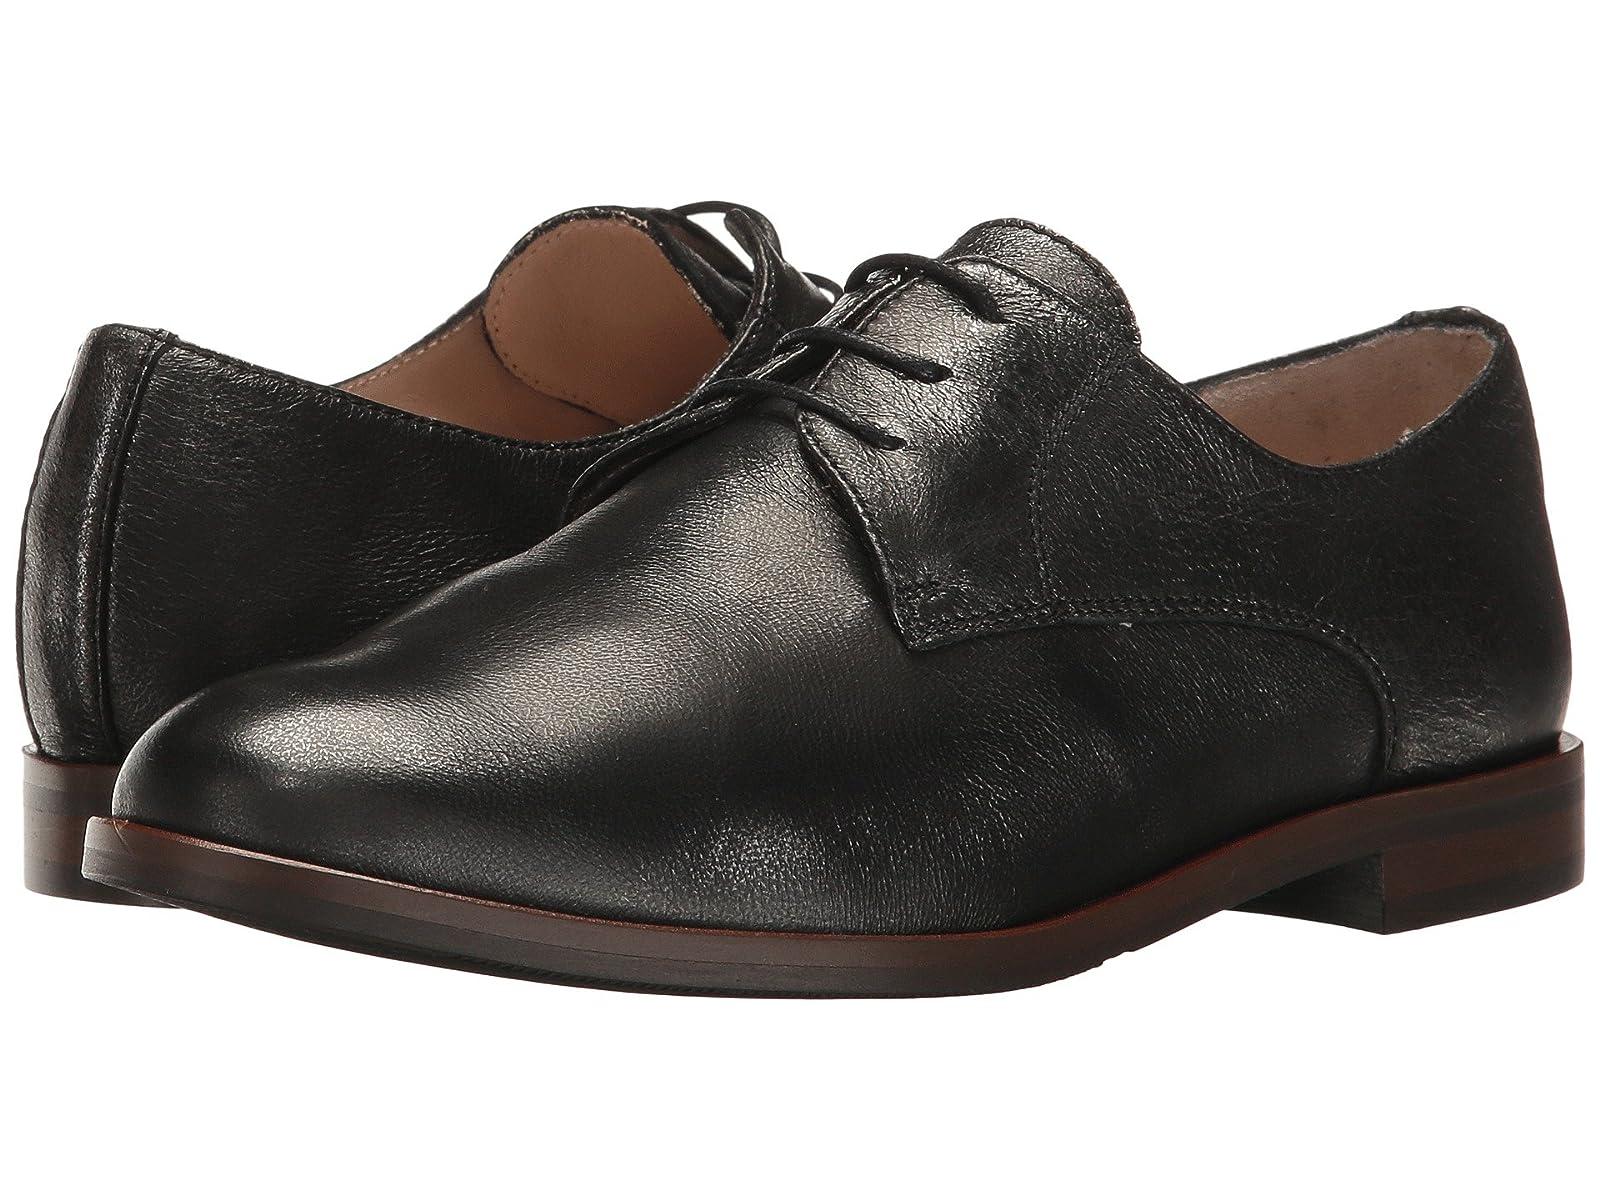 Massimo Matteo Plain Toe BlucherCheap and distinctive eye-catching shoes